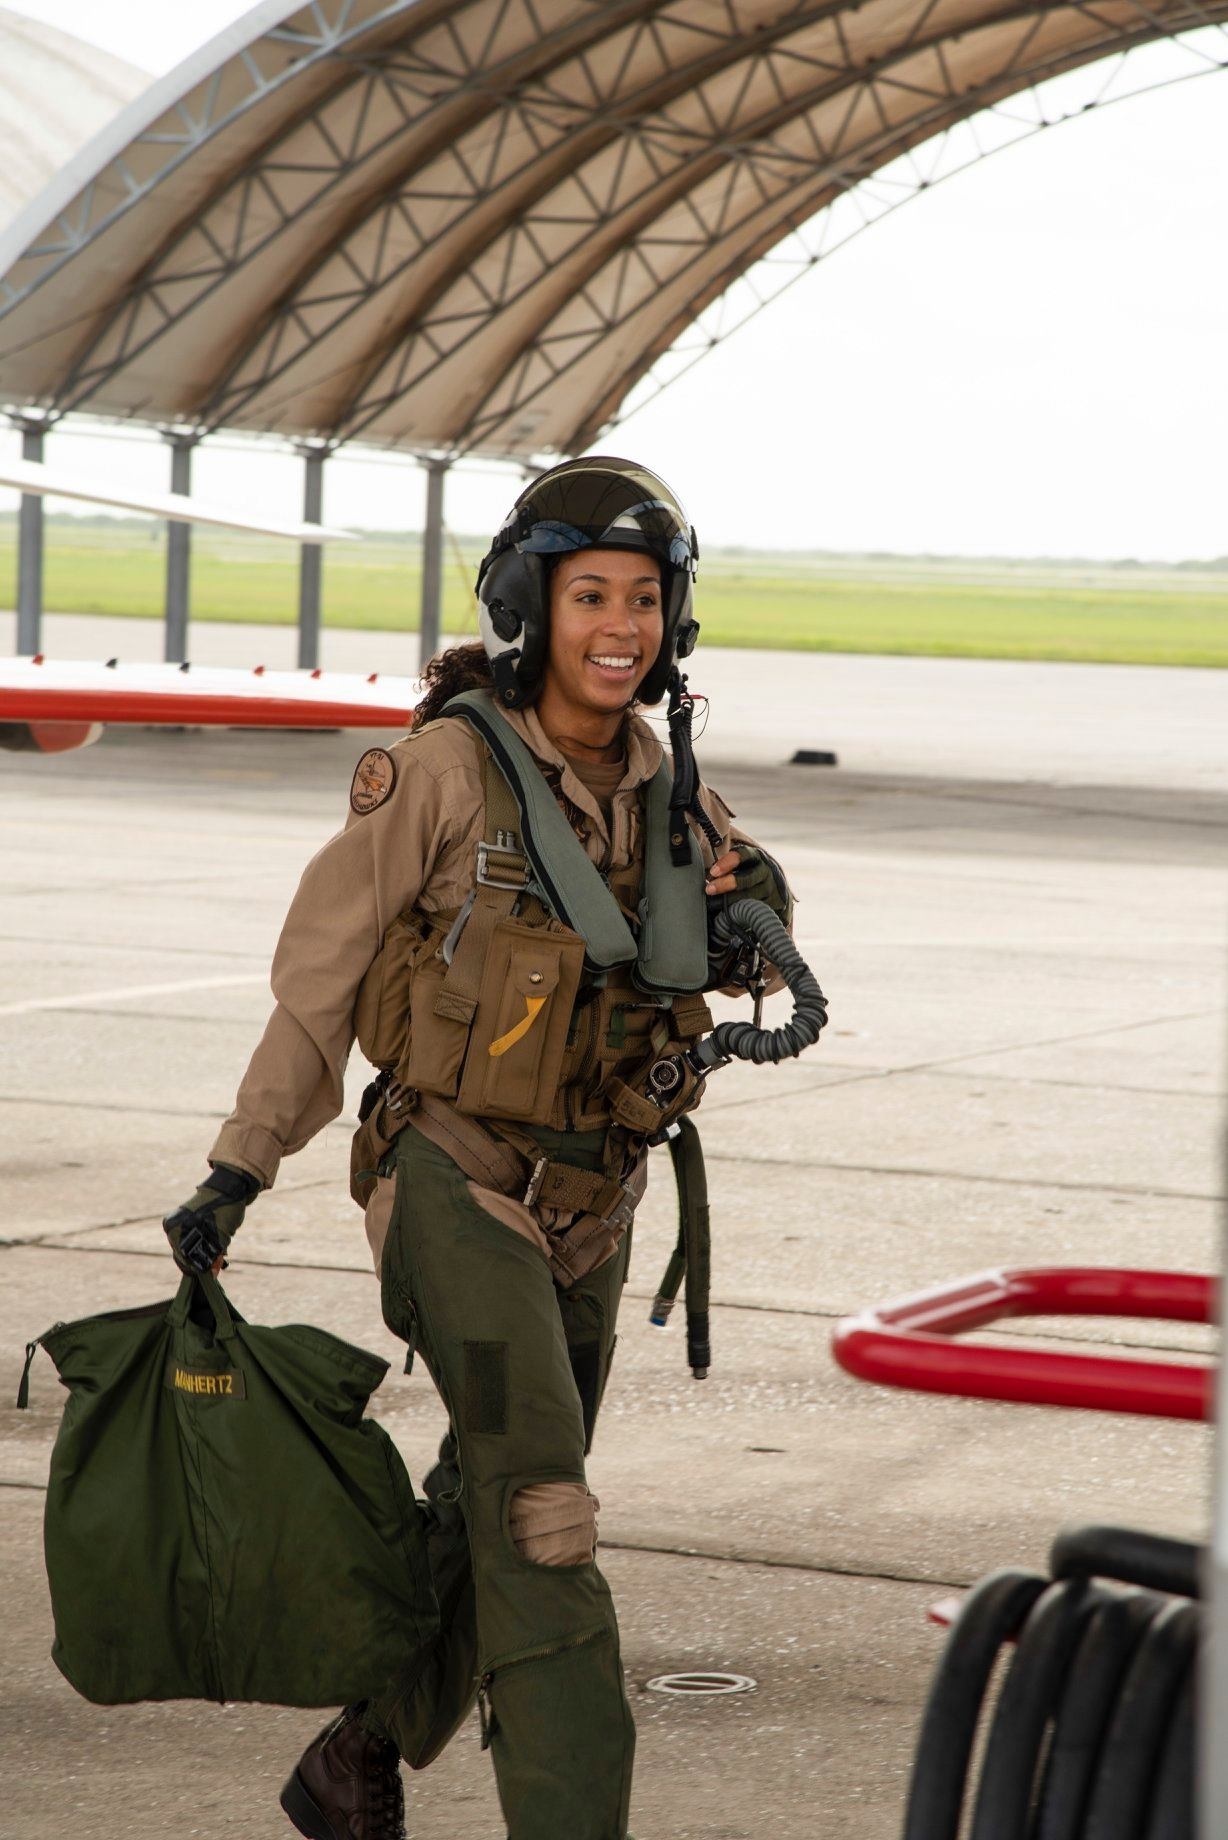 Lt. j.g. Madeline Swegle, U.S. Navy tactical jet pilot